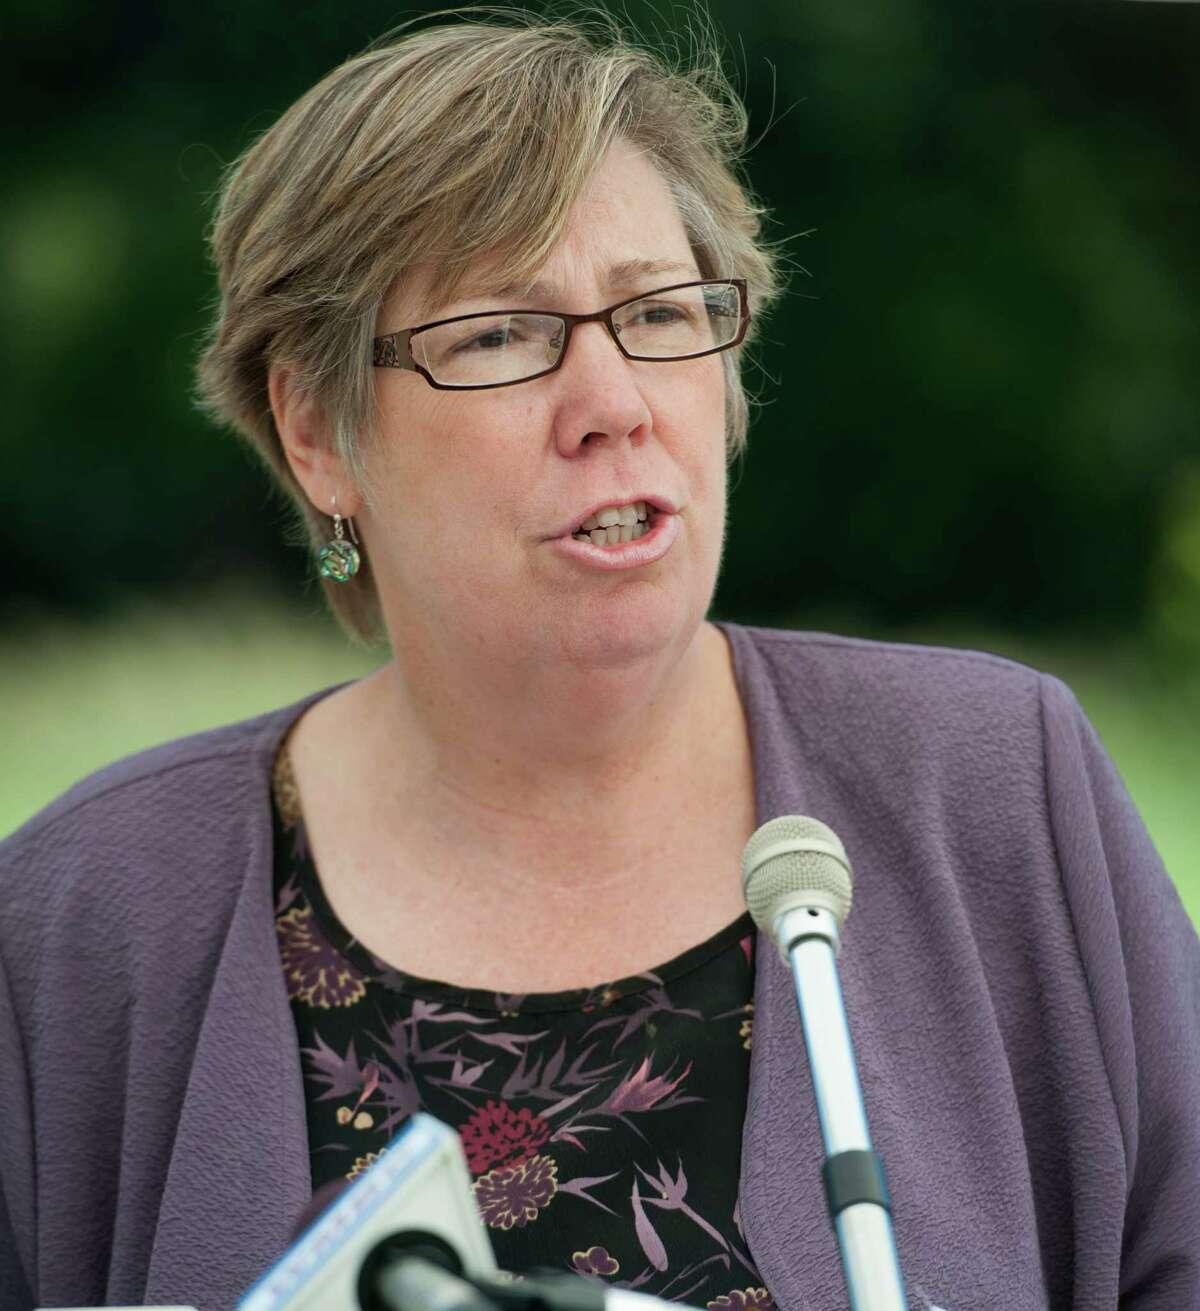 101977 ---Wayne --- Friday, September 25, 2012 --- EPA Regional Administrator Judith Enck AMY NEWMAN/STAFF PHOTOGRAPHER